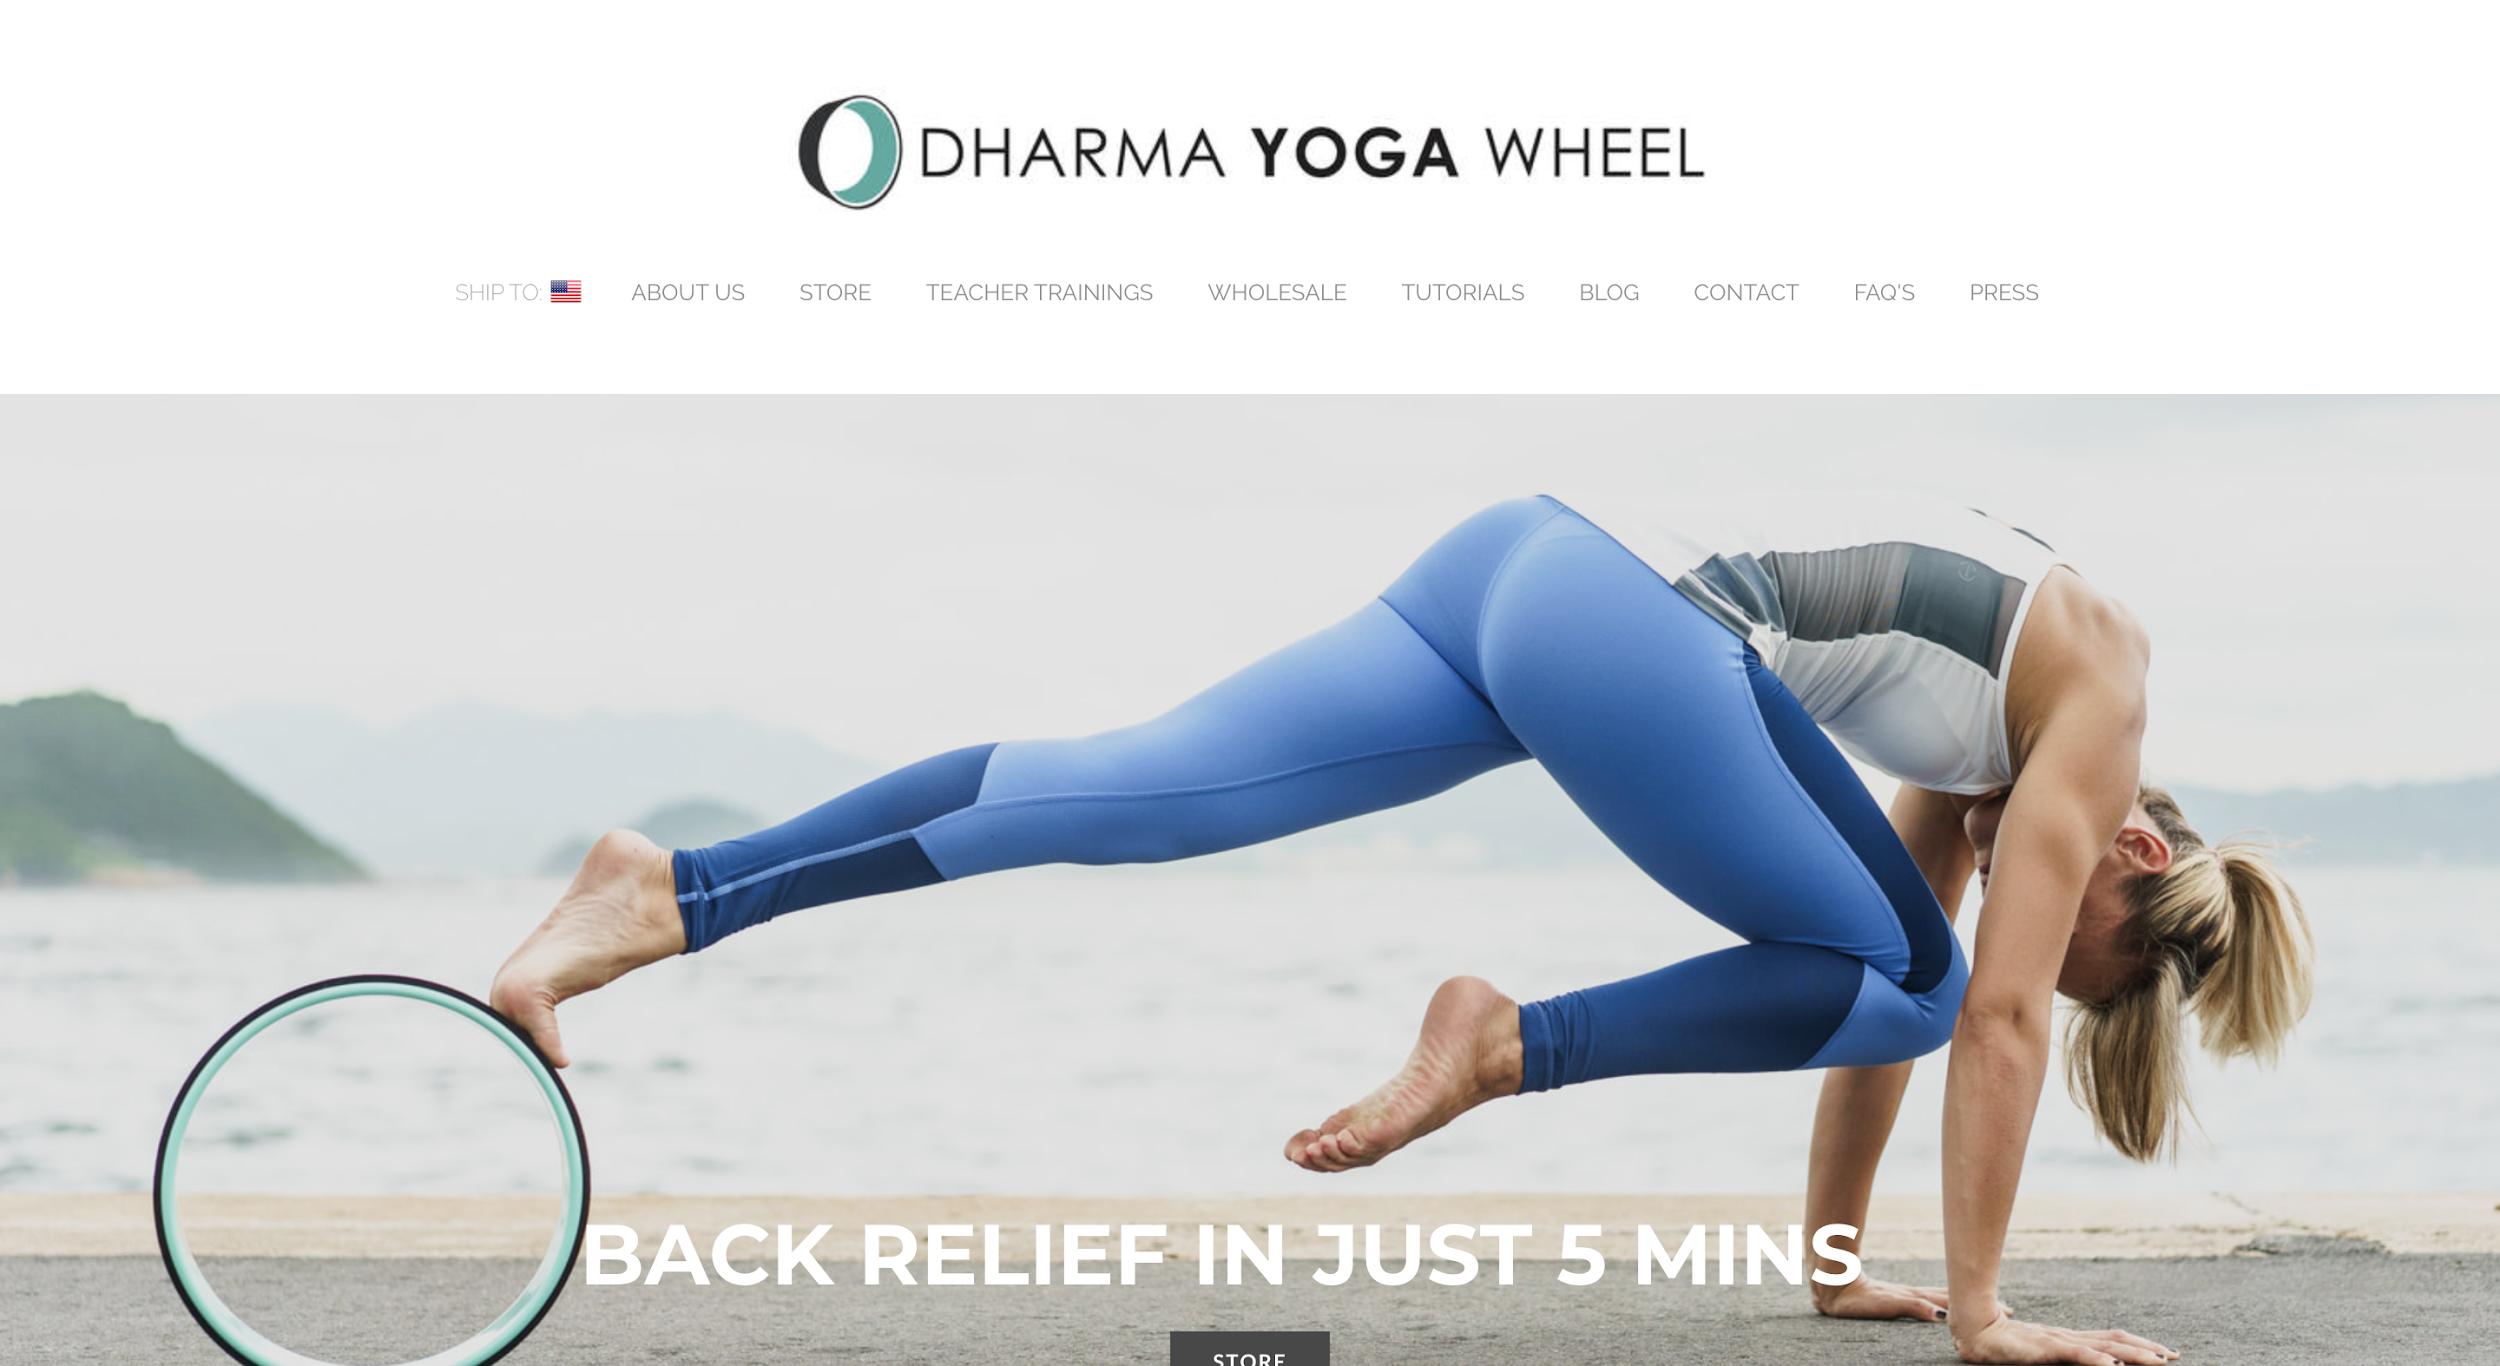 Dharma Yoga Wheel - example of ecommerce store design